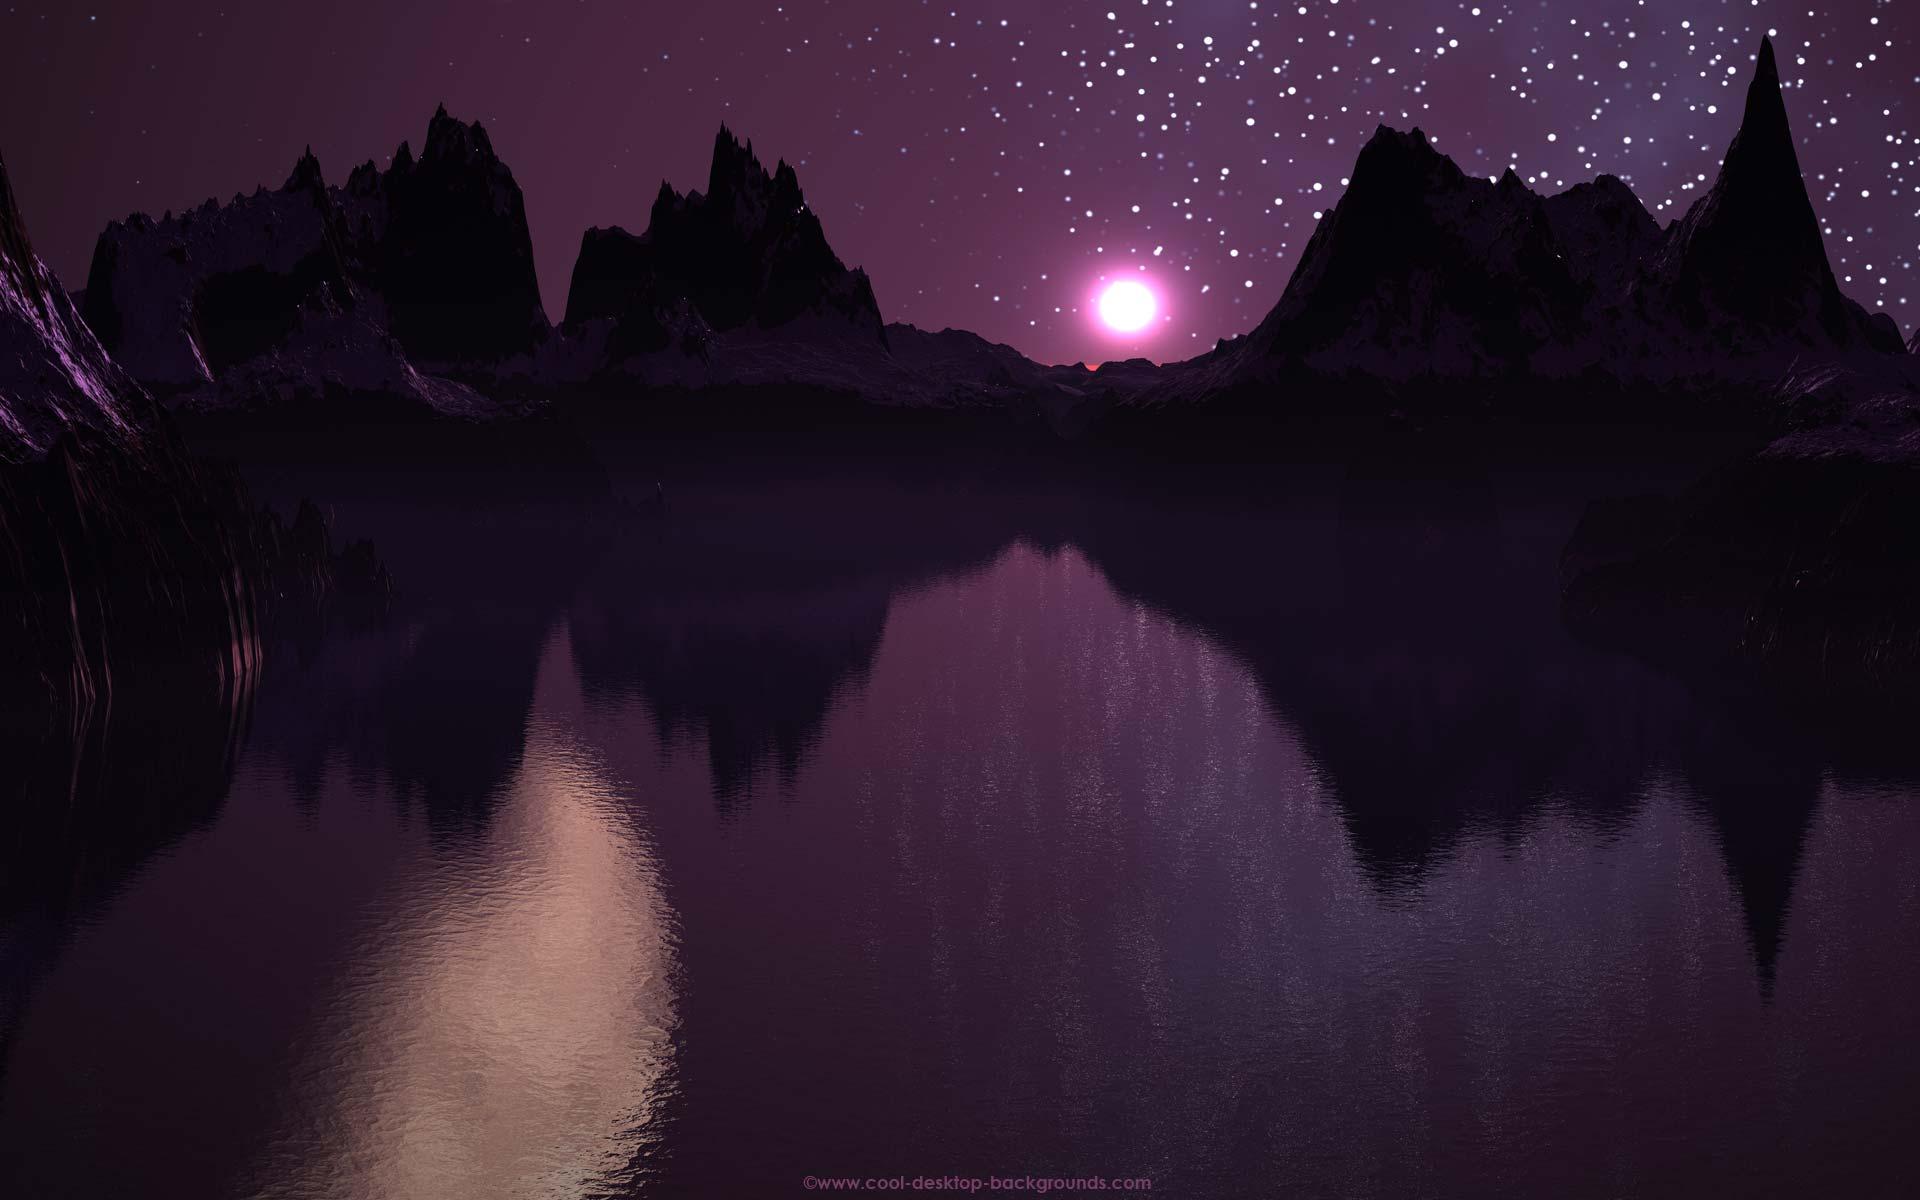 backgrounds landscape fjord midnight purple desktops wallpaper 1920x1200